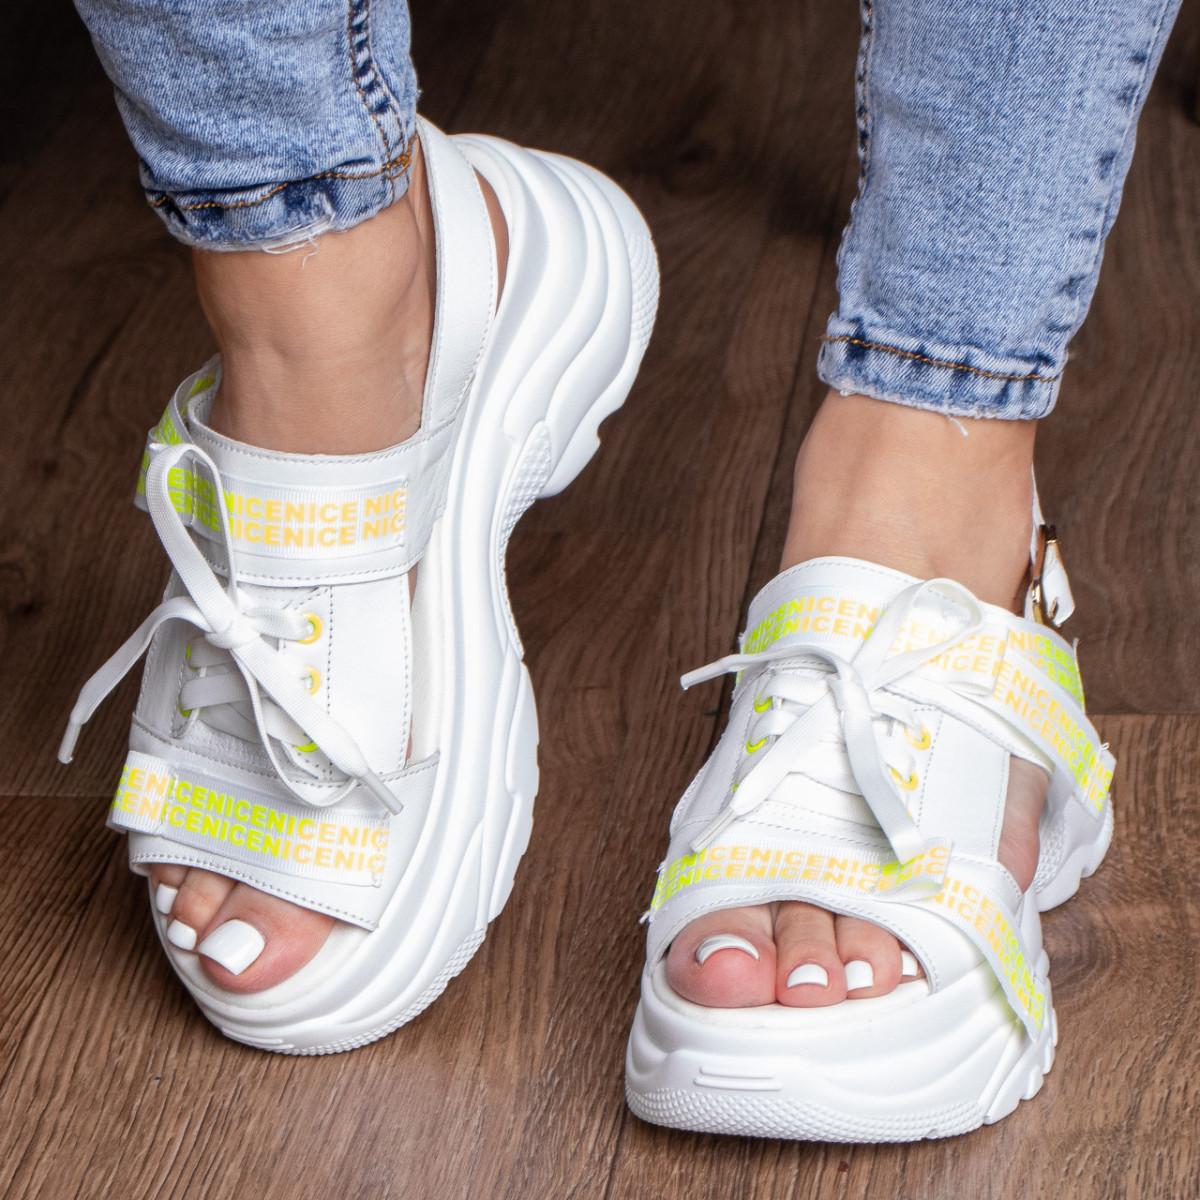 Женские сандалии Fashion Taffy 3016 36 размер 23 см Белый